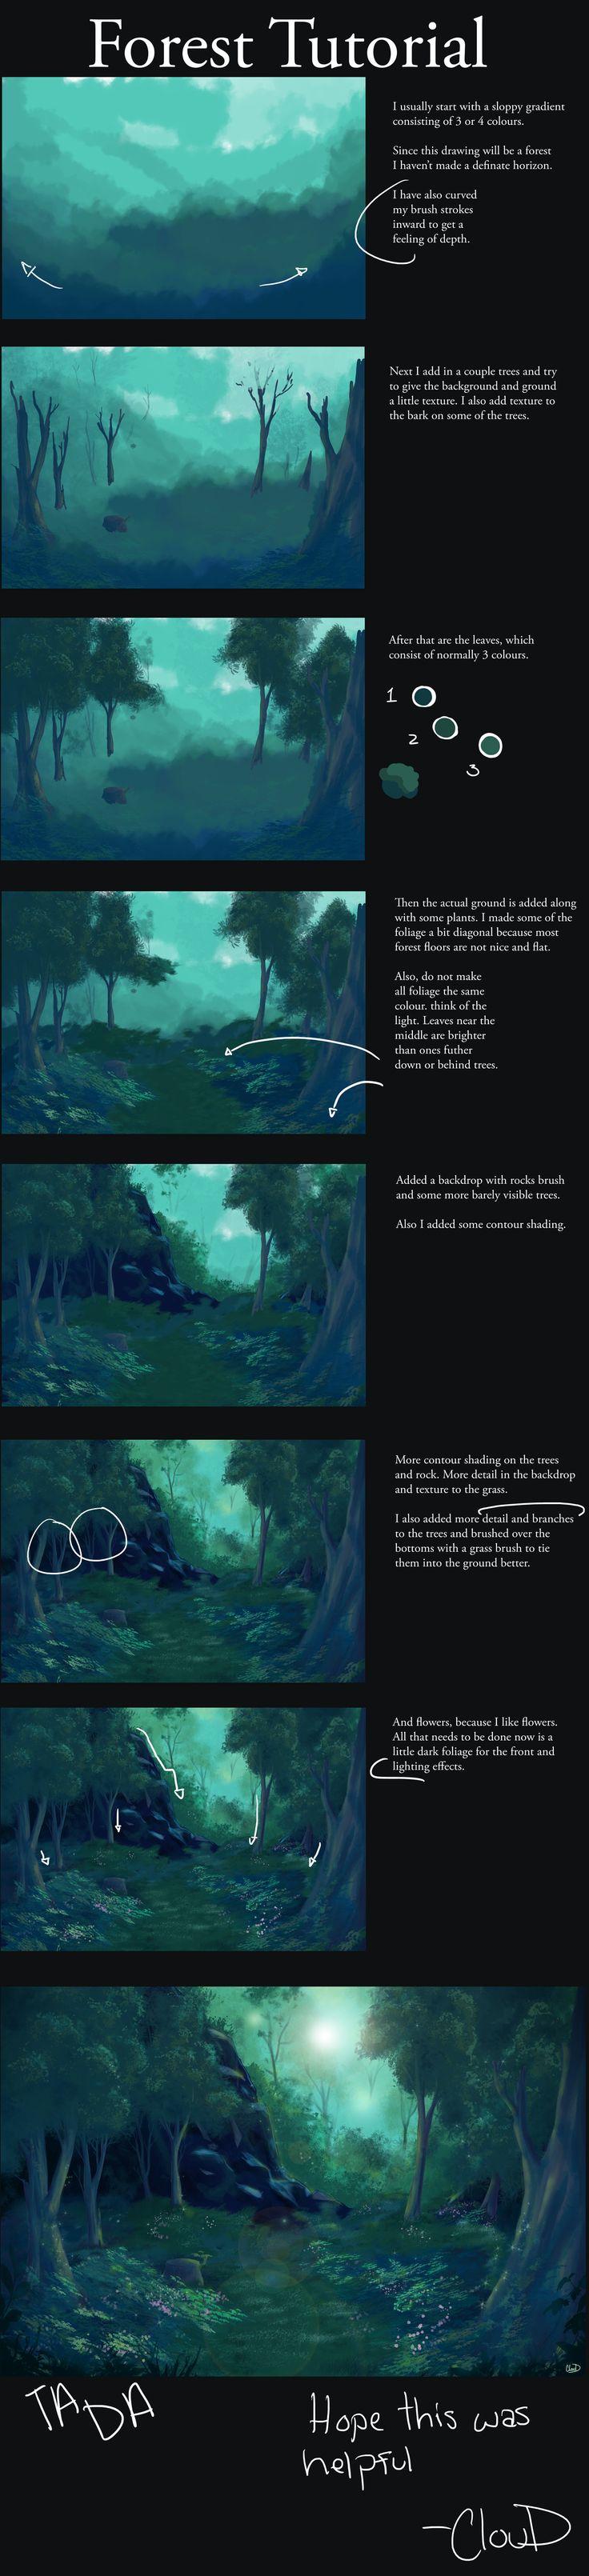 Forest tutorial by Aniplay.deviantart.com on @deviantART